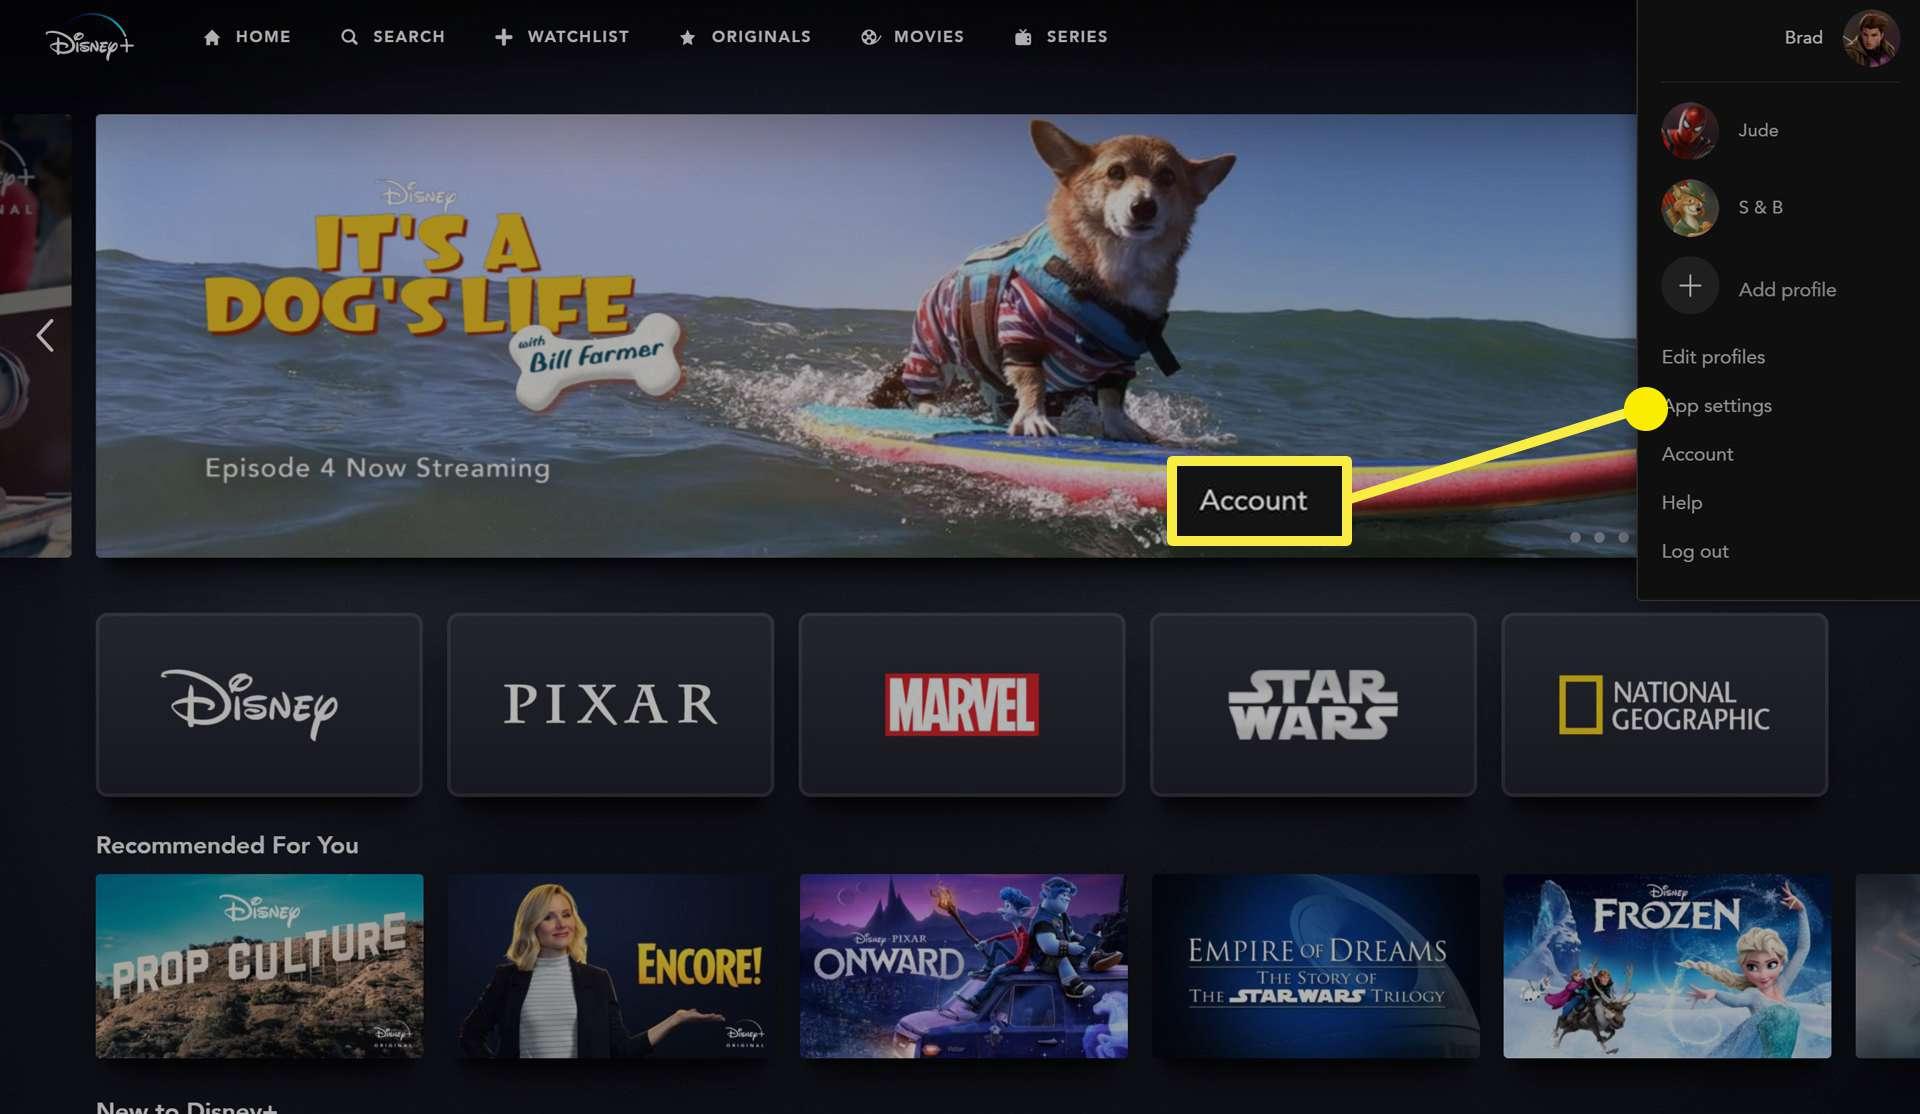 Disney Plus website account menu.